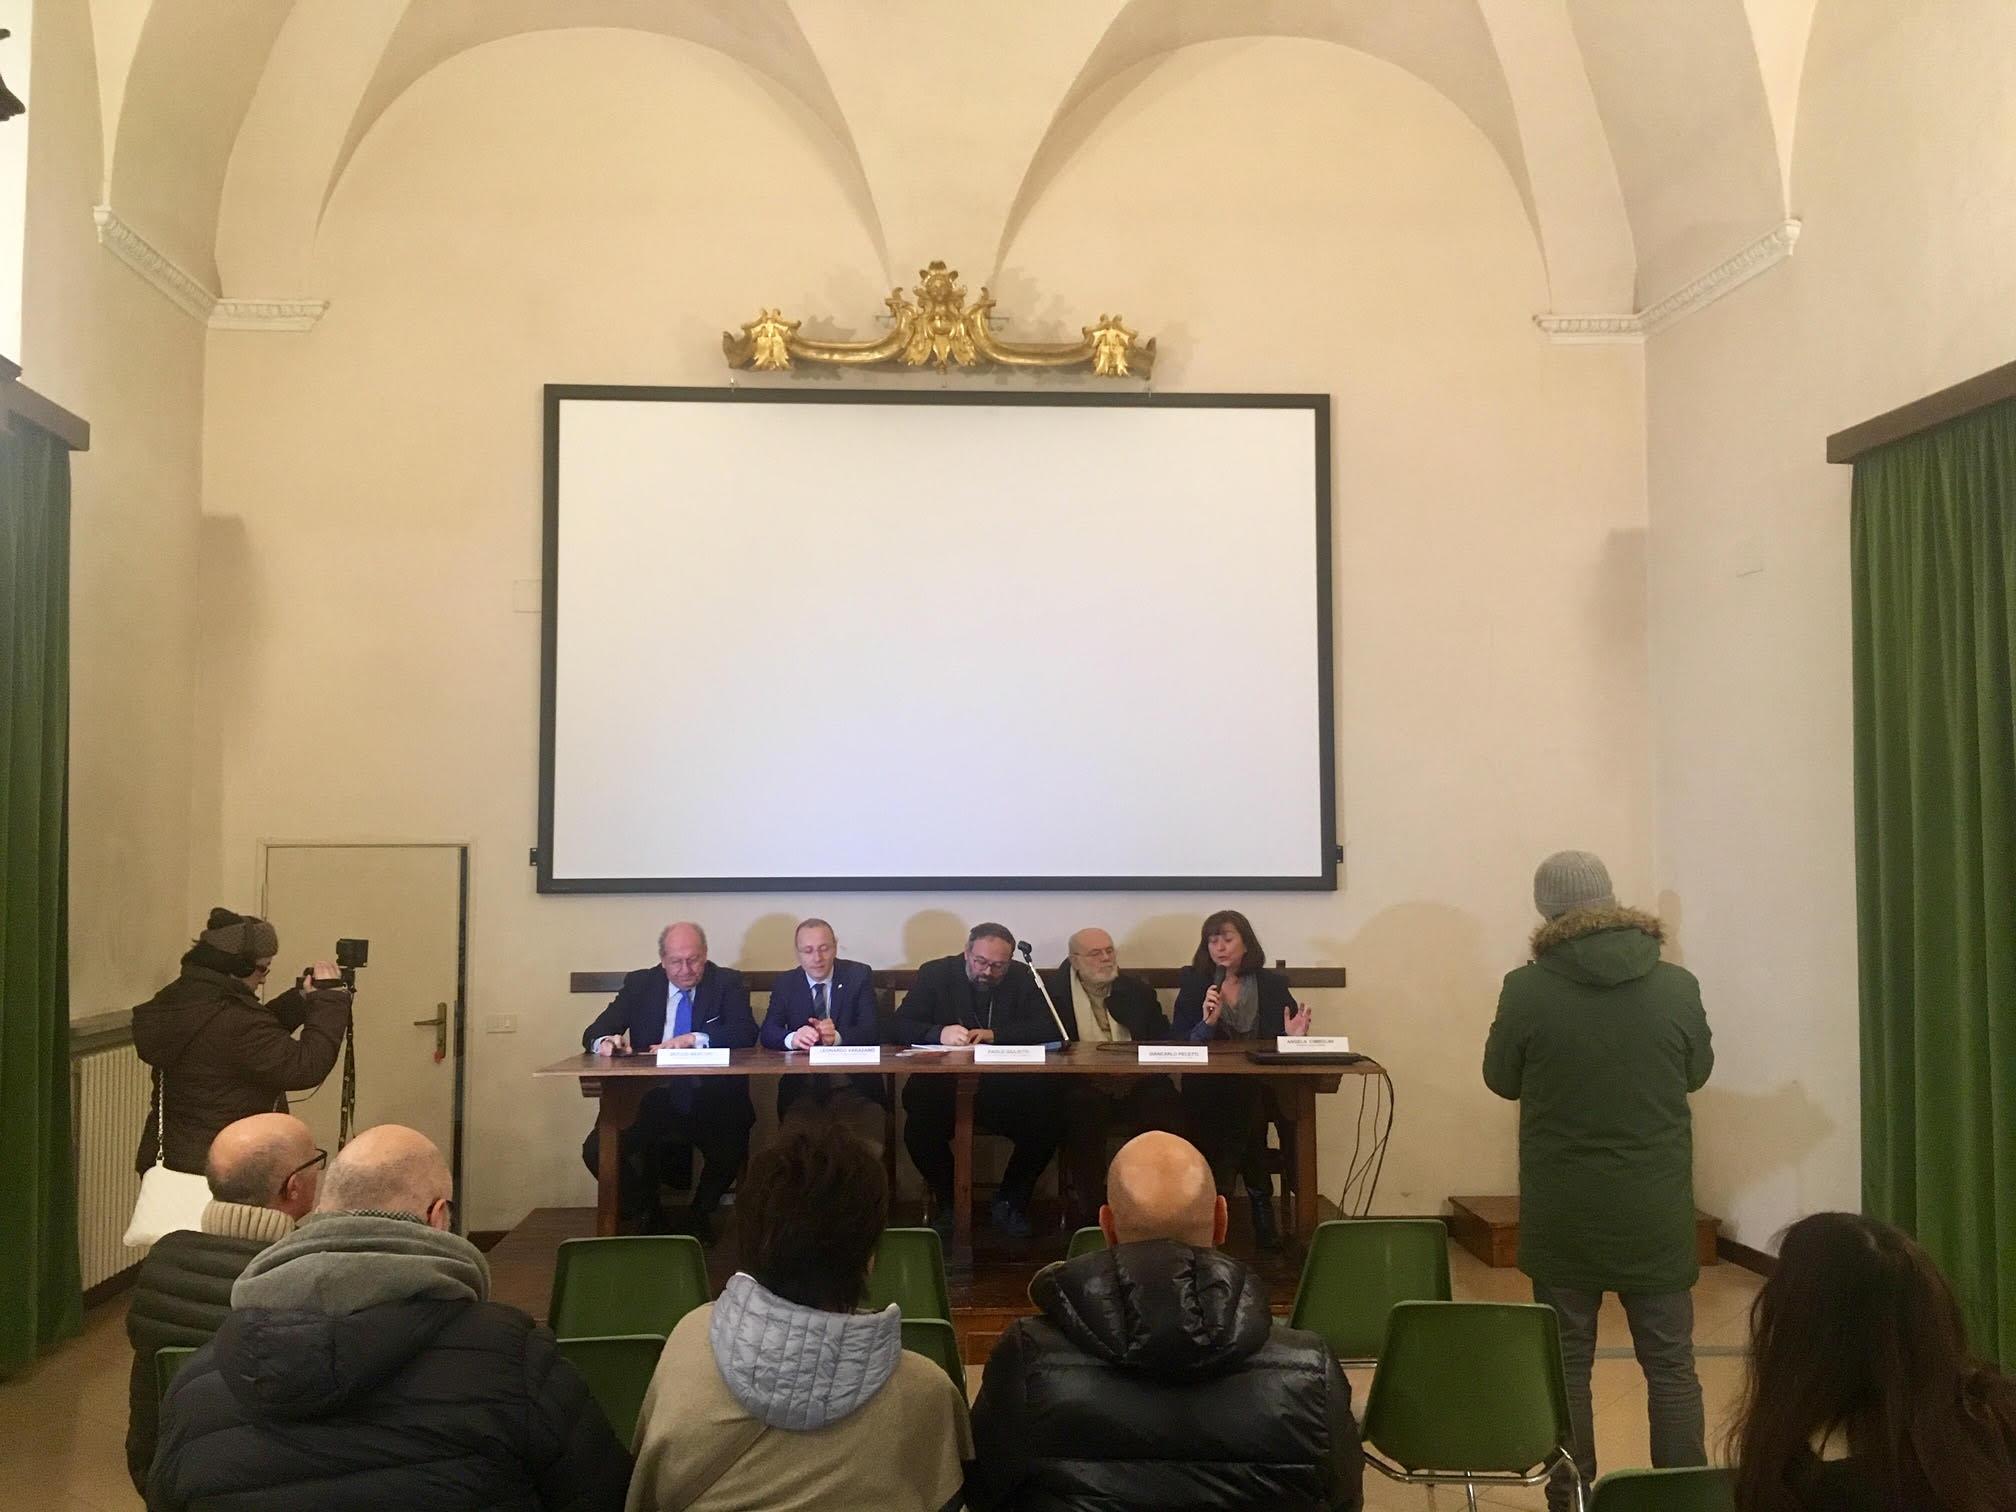 2018-12-14_Presentazione-da-natale-a-san-costanzo3